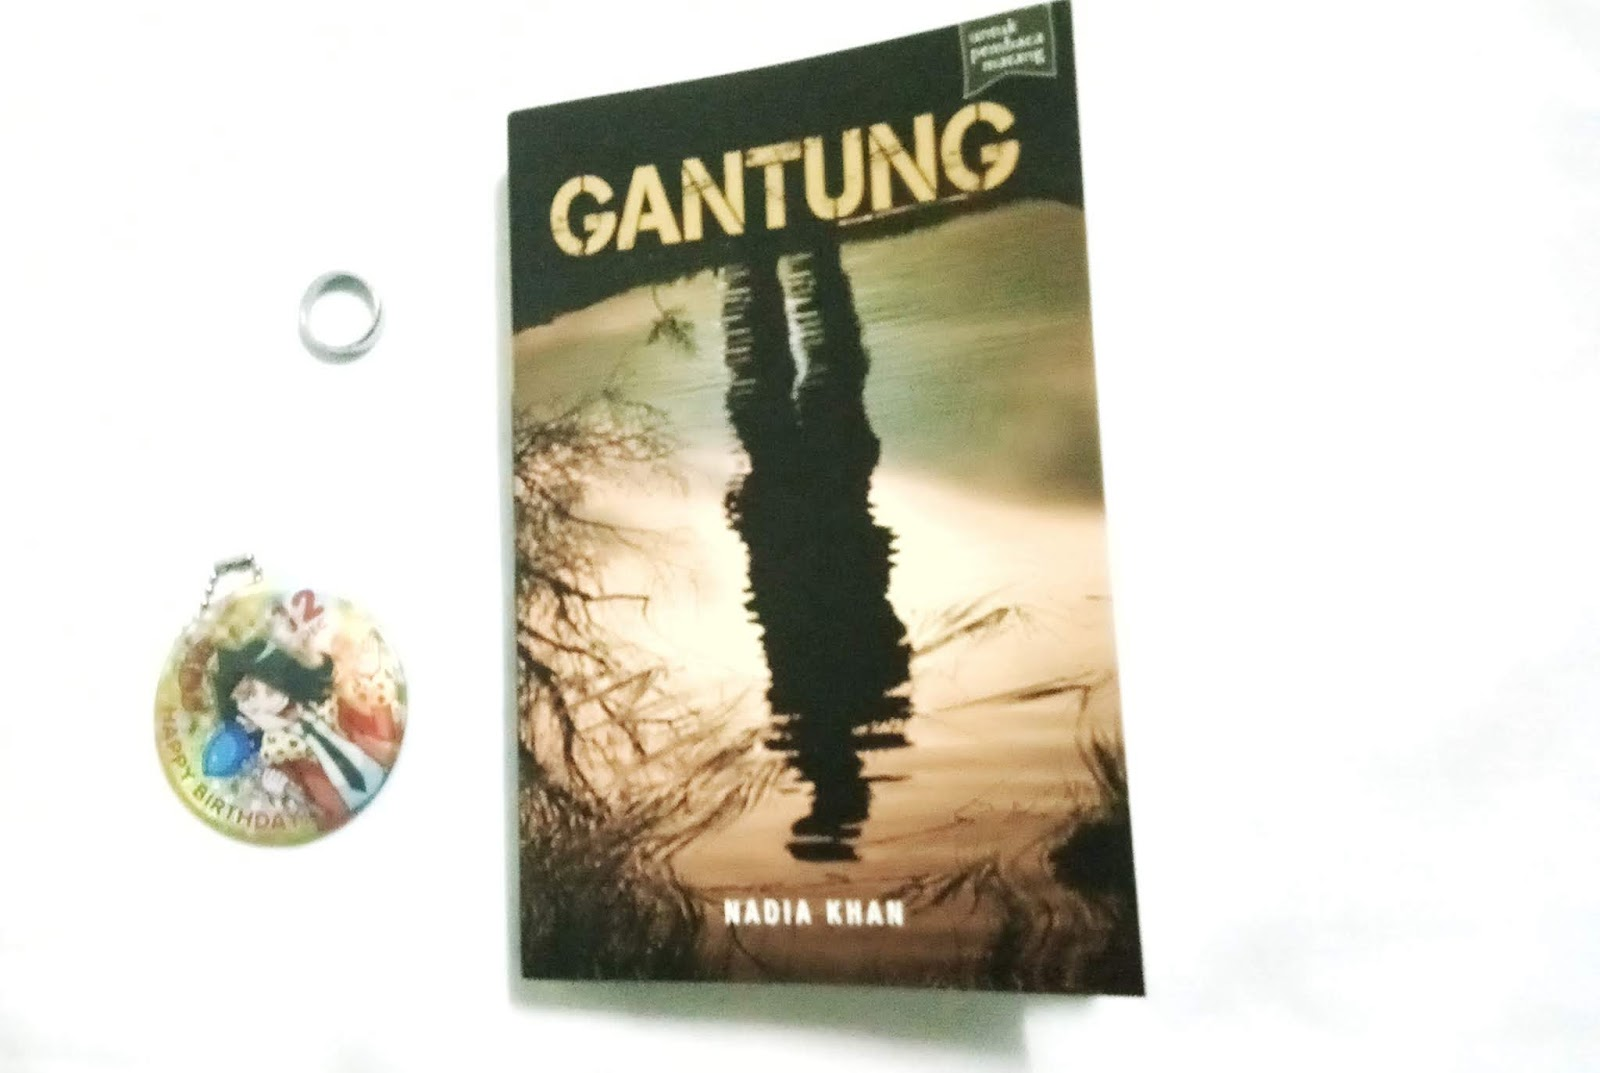 Review Gantung by Nadia Khan